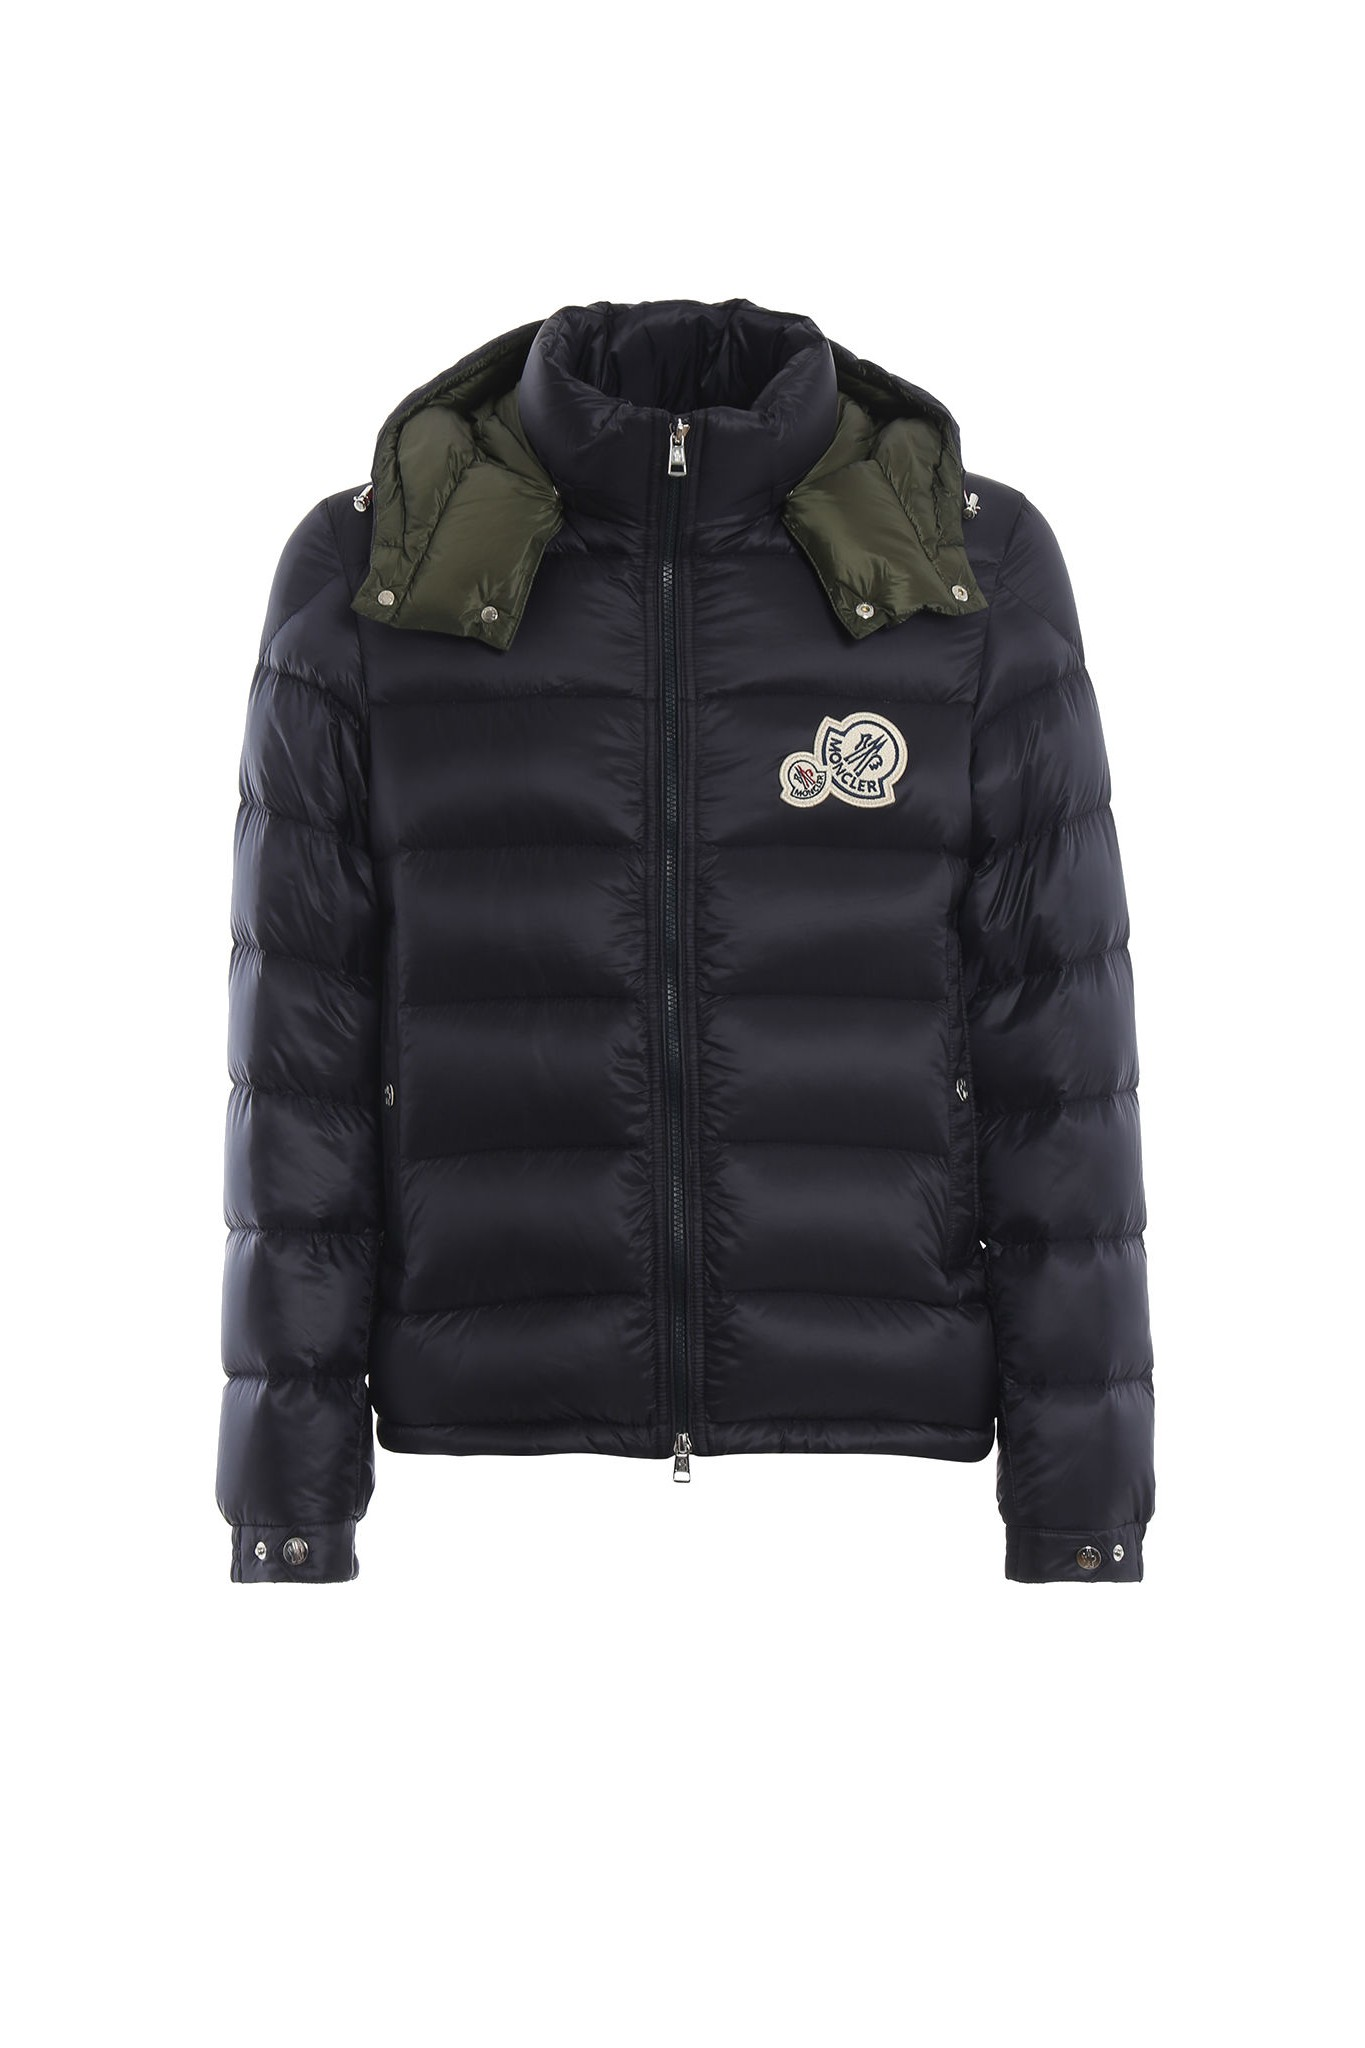 56b9dc161 Shop online Bramant navy down jacket